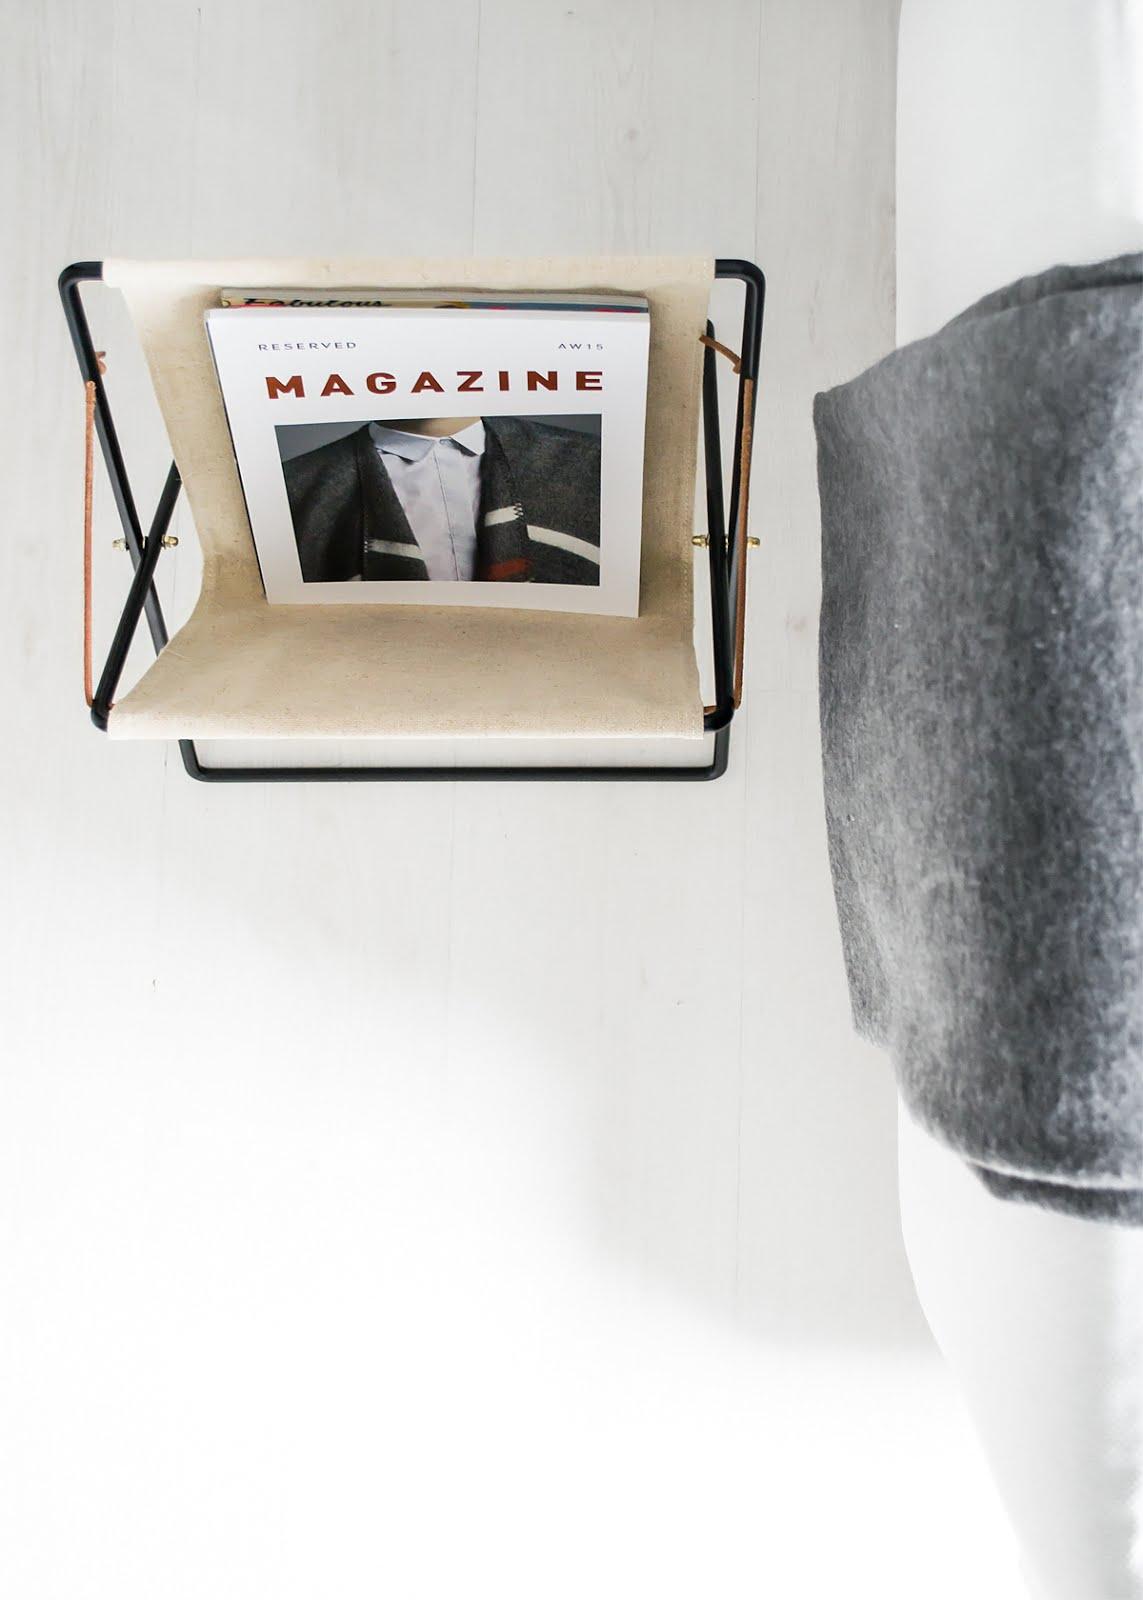 Ferm living, magazine holder, herman, tijdschriften houder, interior design, minimal, mister design